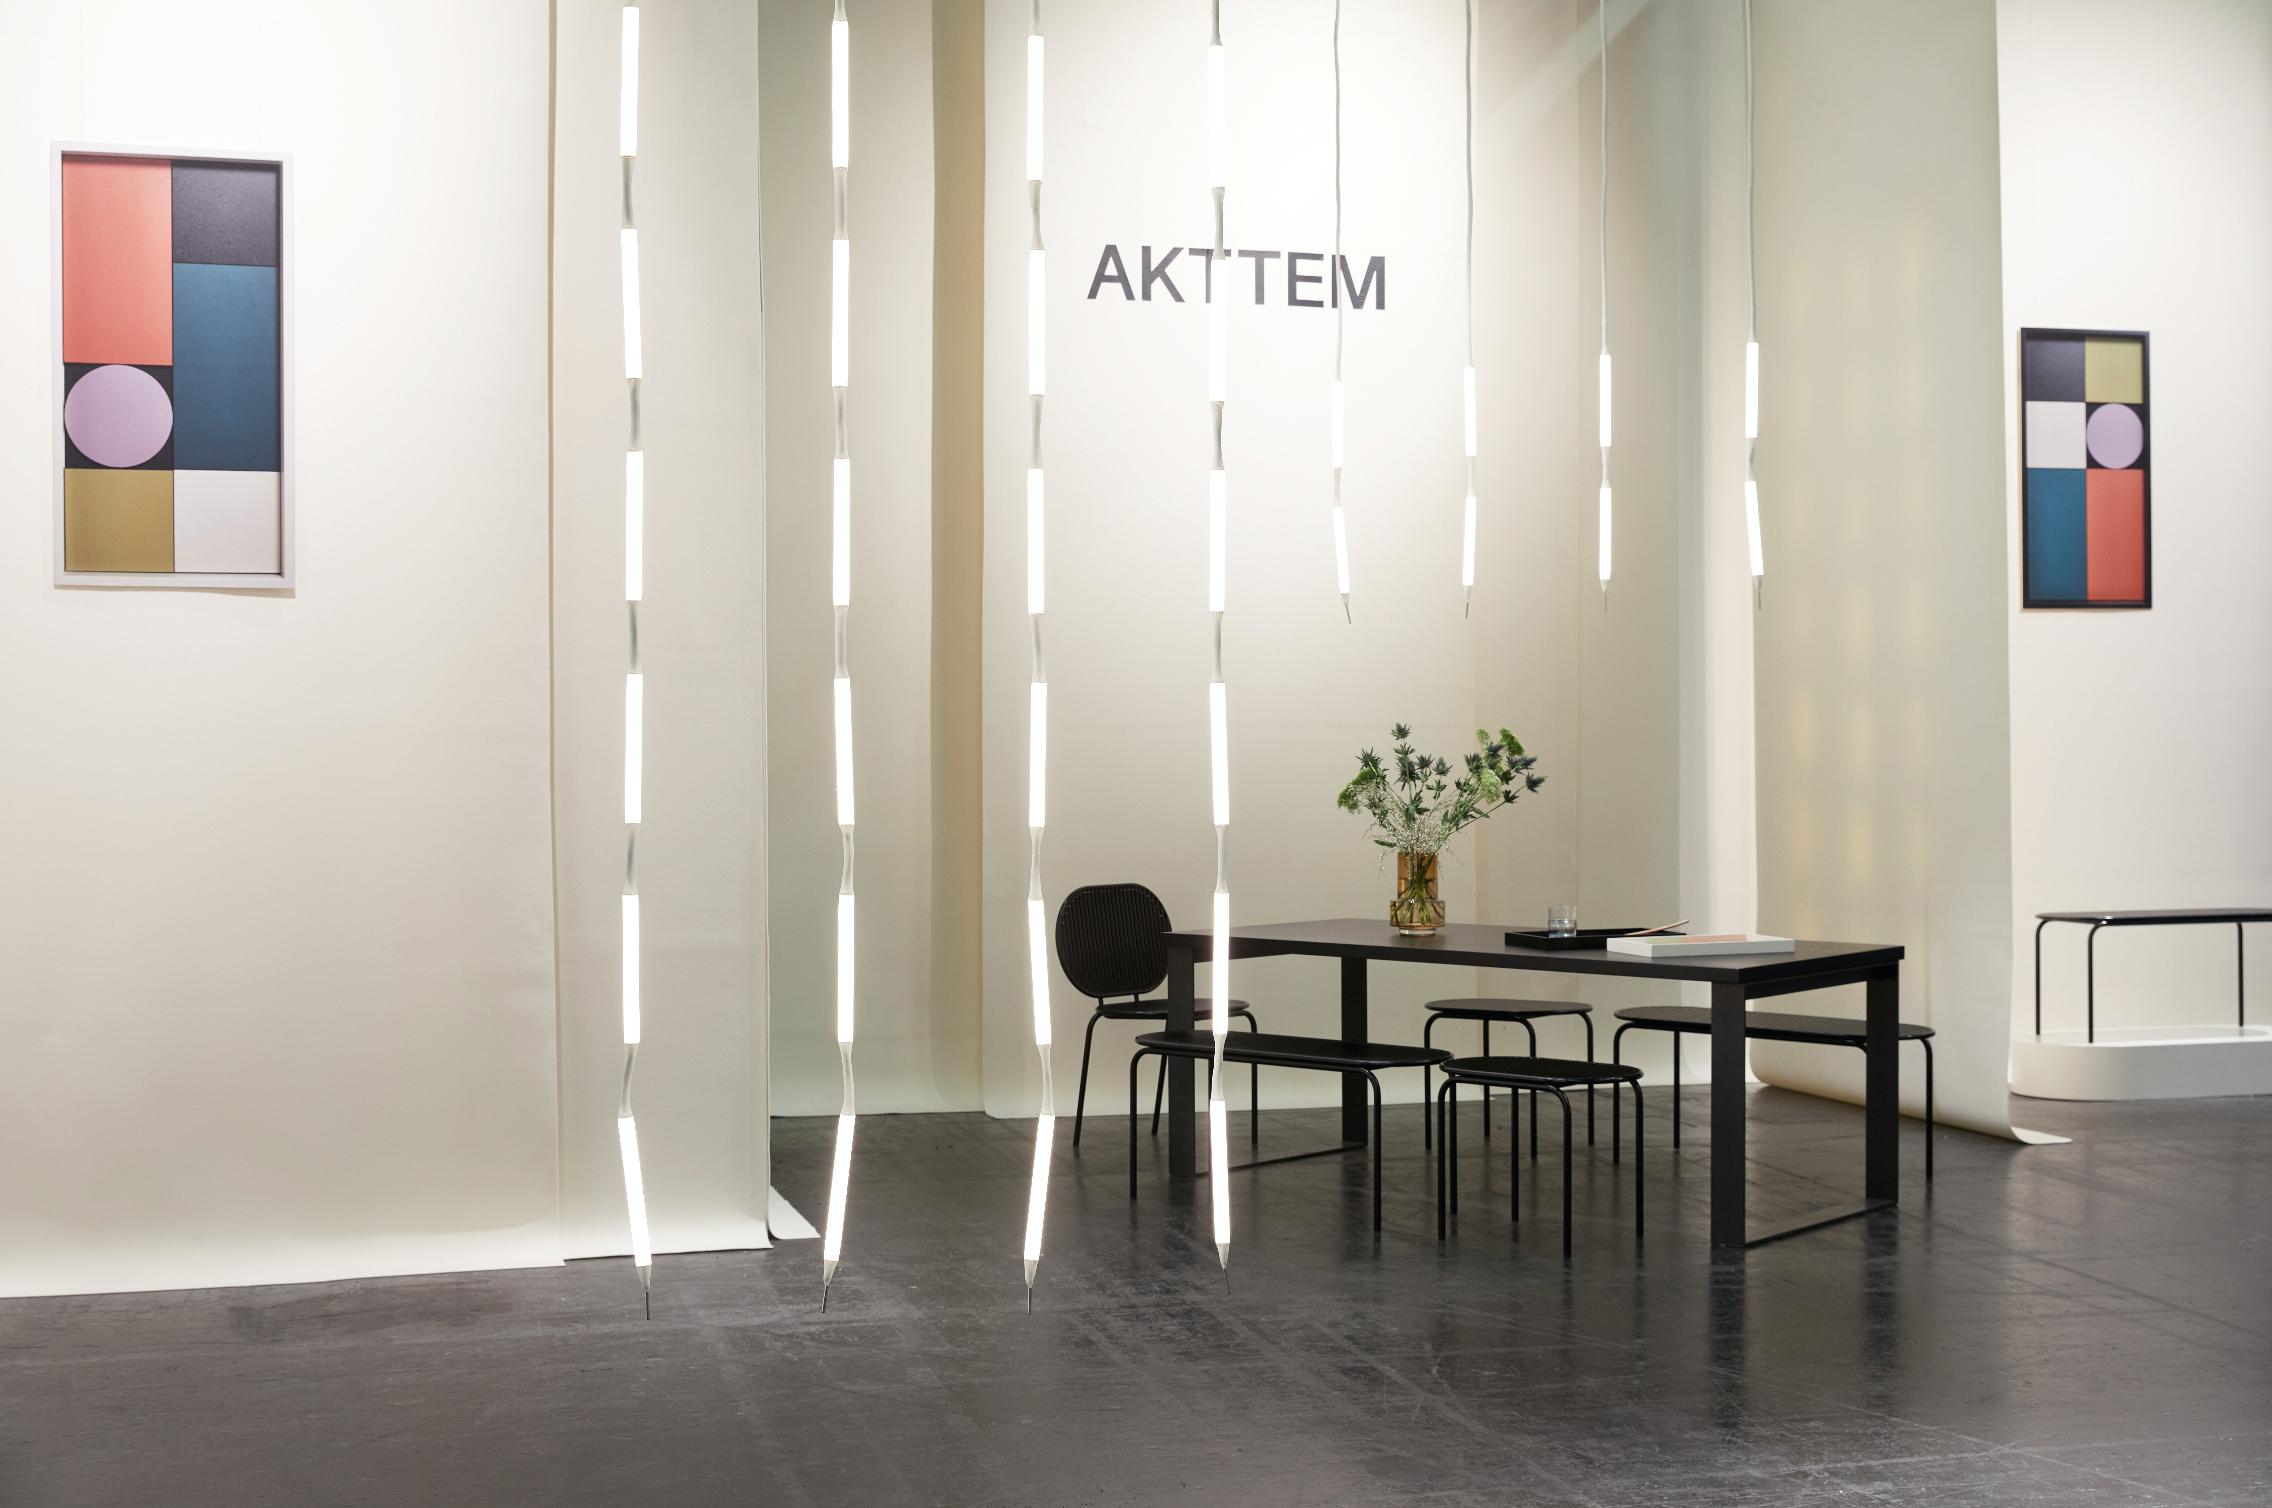 Studio-Verena-Hennig-AKTTEM-Stand-Design-2019